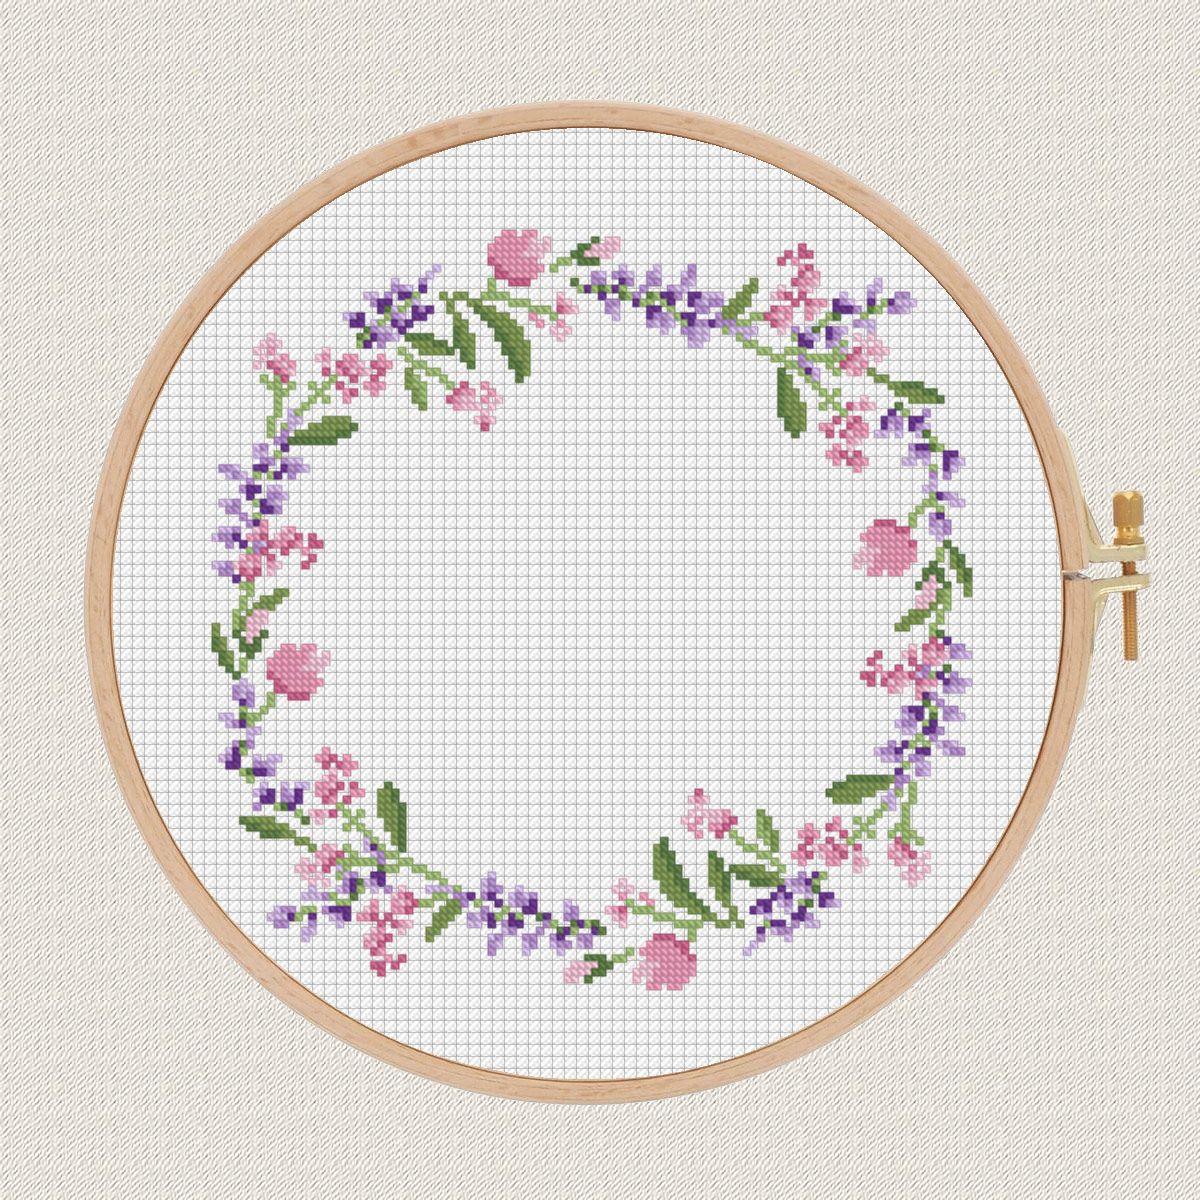 flowers cross stitch pattern Lavender Helleborus floral wreath cross ...